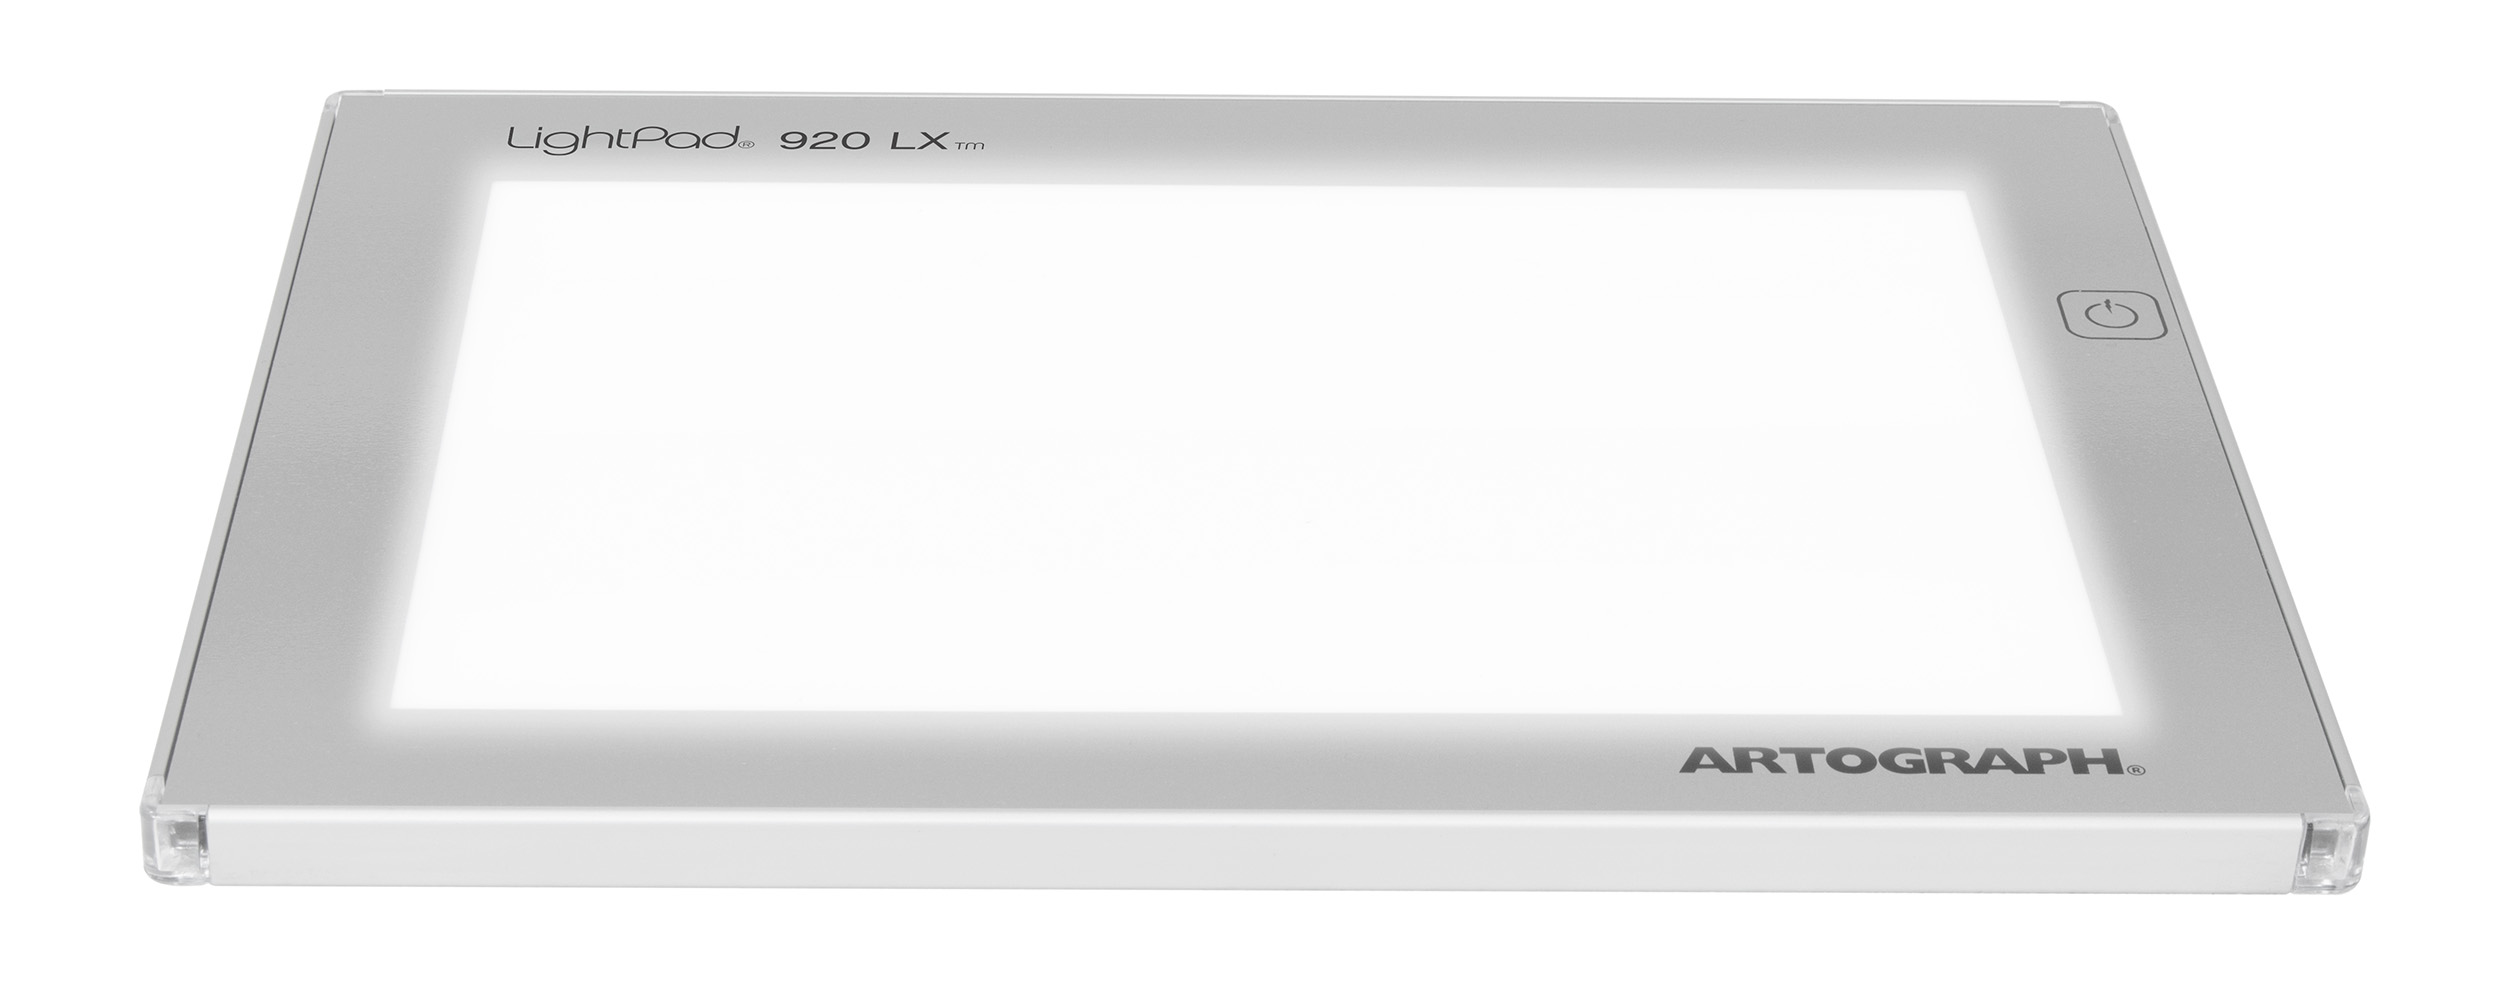 25920-LightPad-920-LX-front